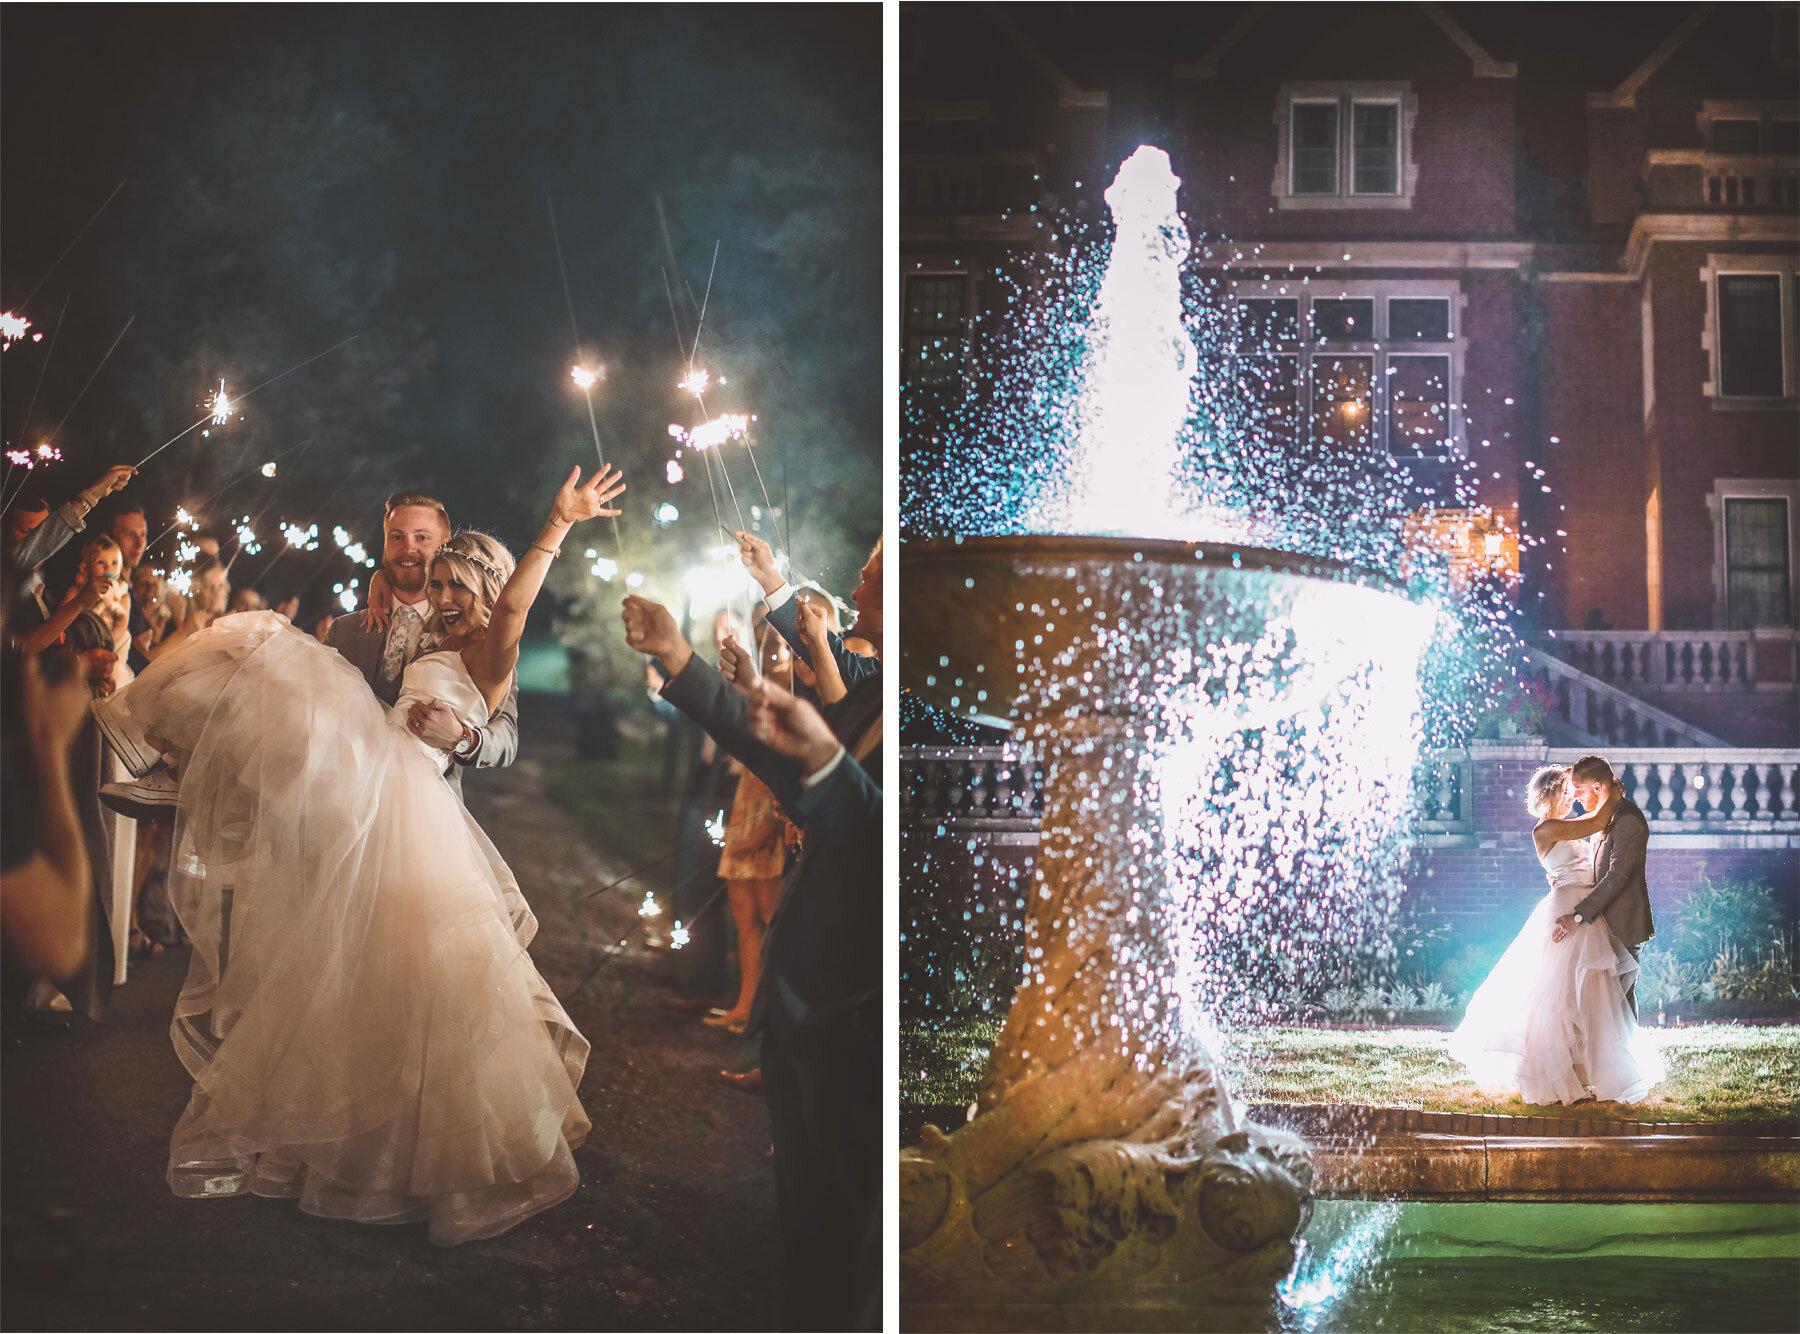 24-Vick-Photography-Wedding-Duluth-Minnesota-Glensheen-Mansion-Sparkler-Send-Off-Fountain-Catherine-and-John.jpg.jpg